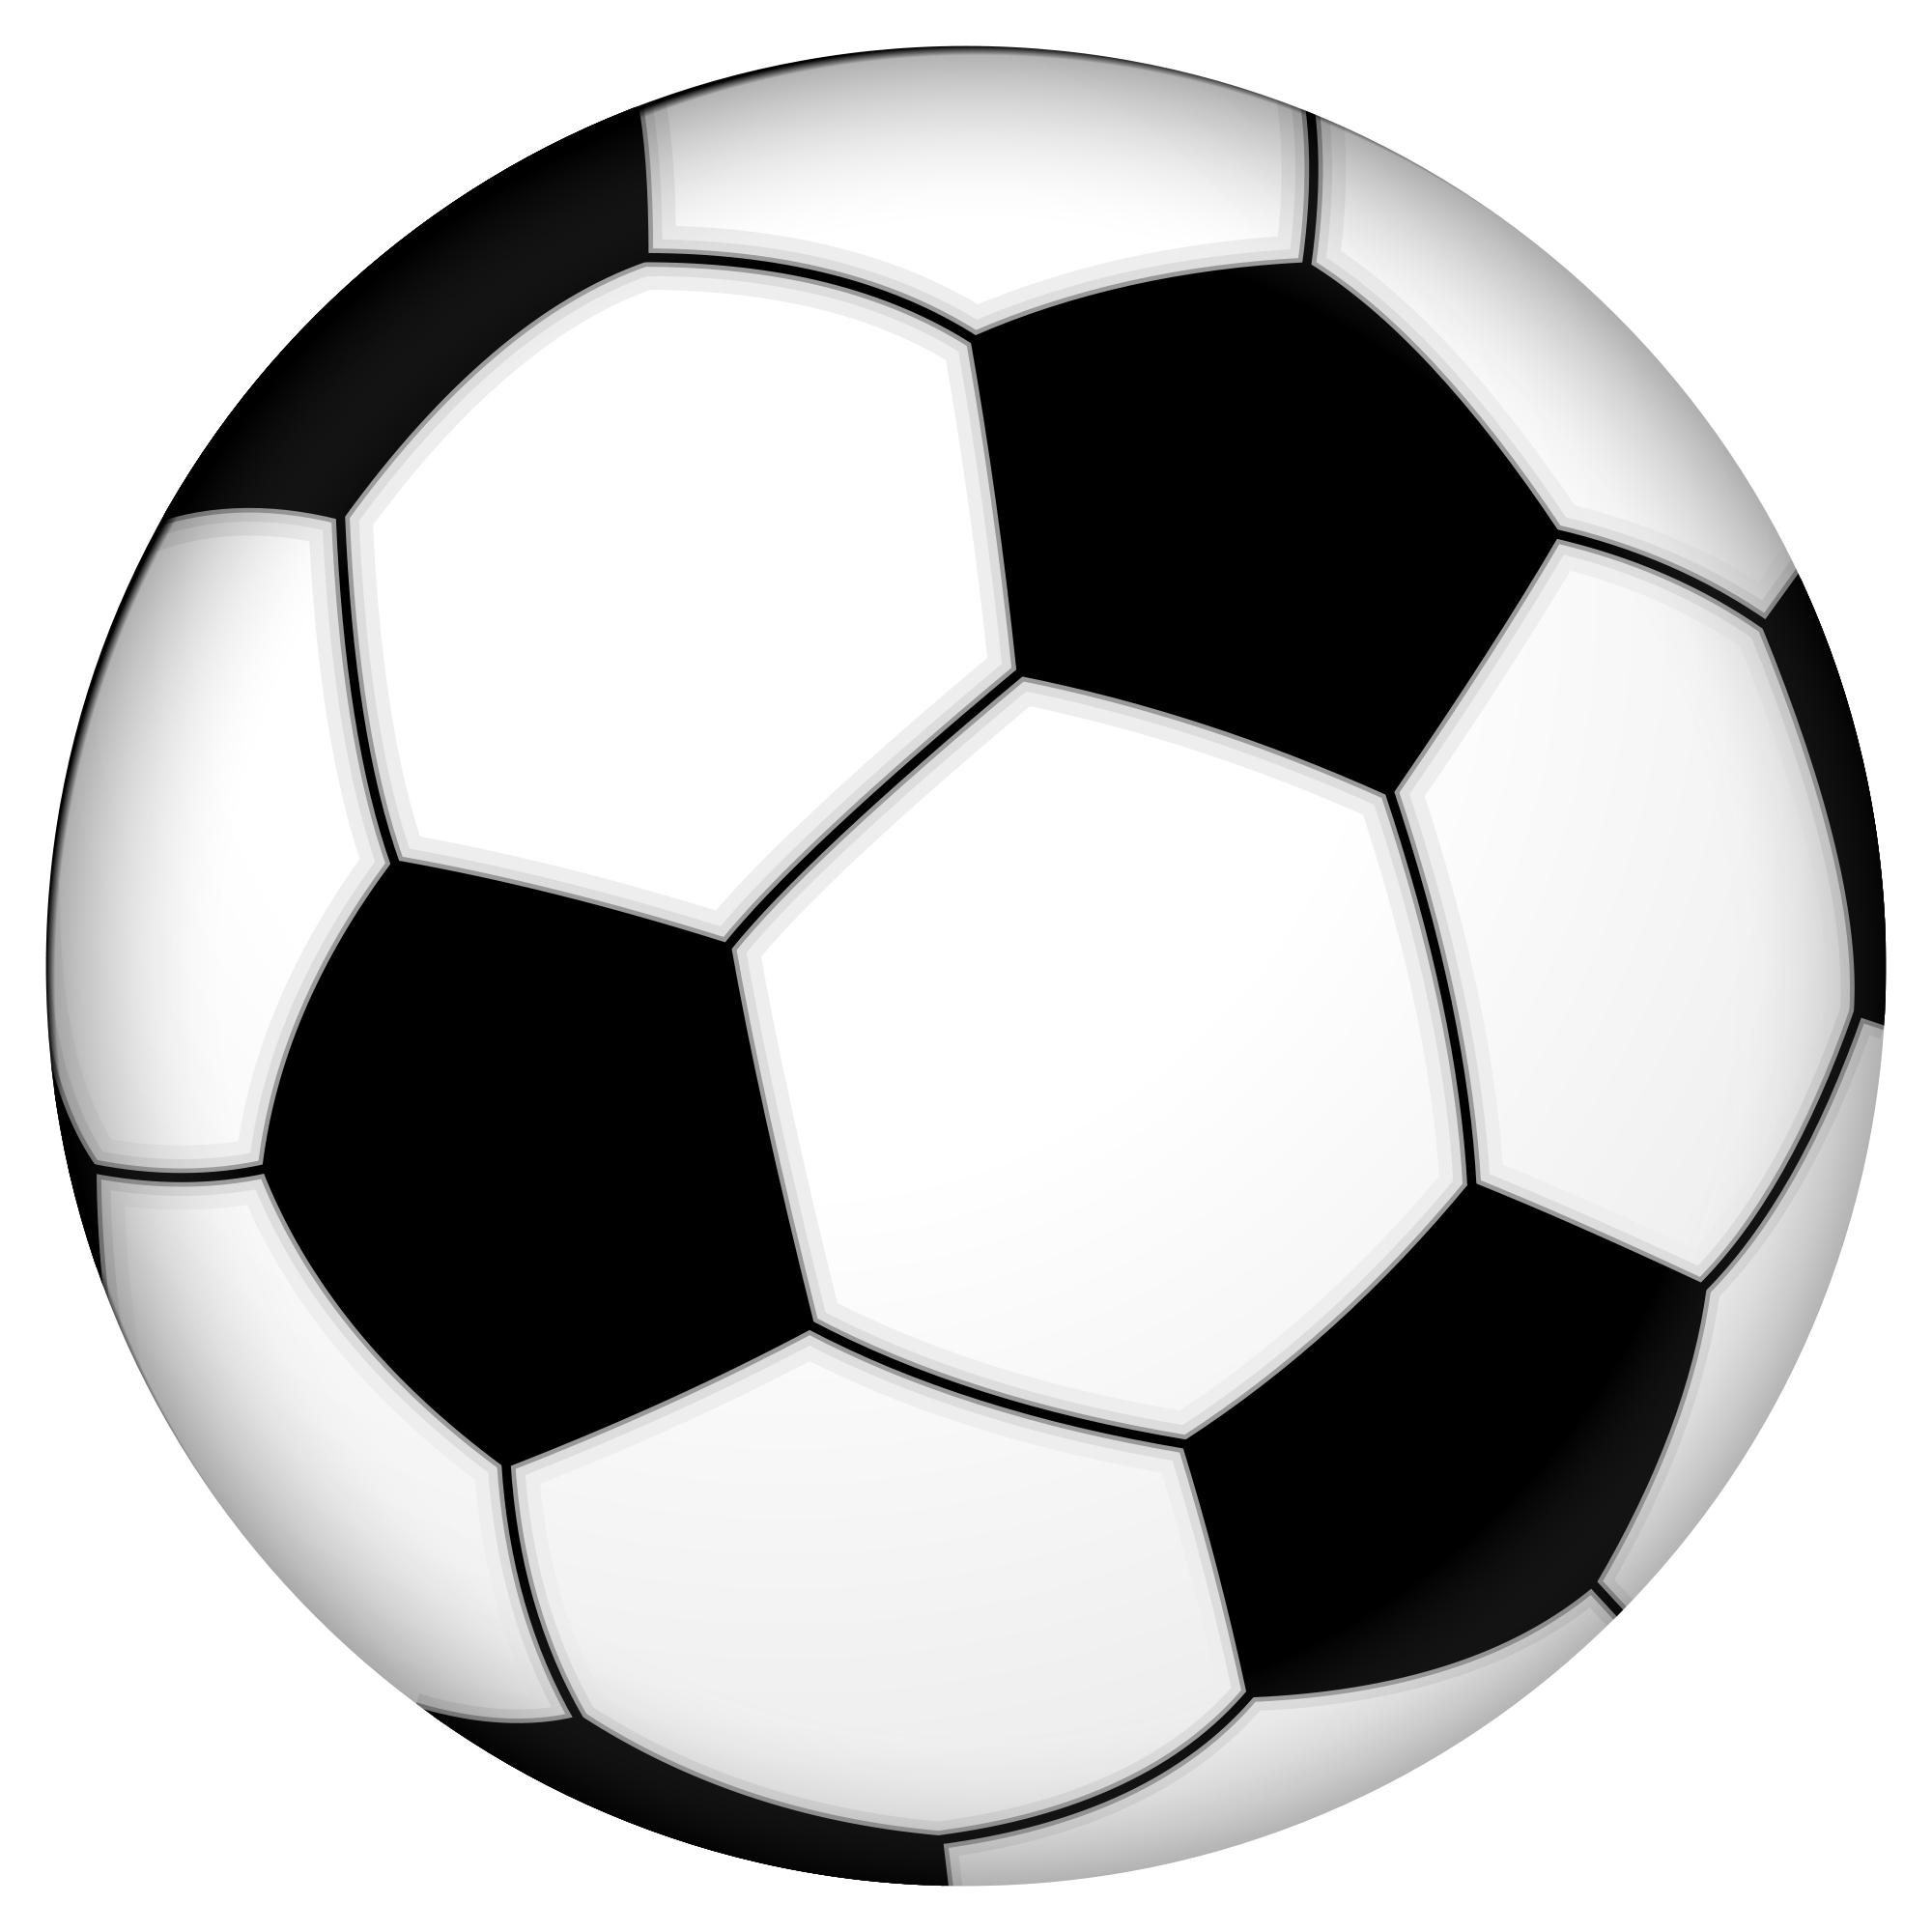 Kicking Soccer Ball Clip Art Clipart Panda Free Clipart Images